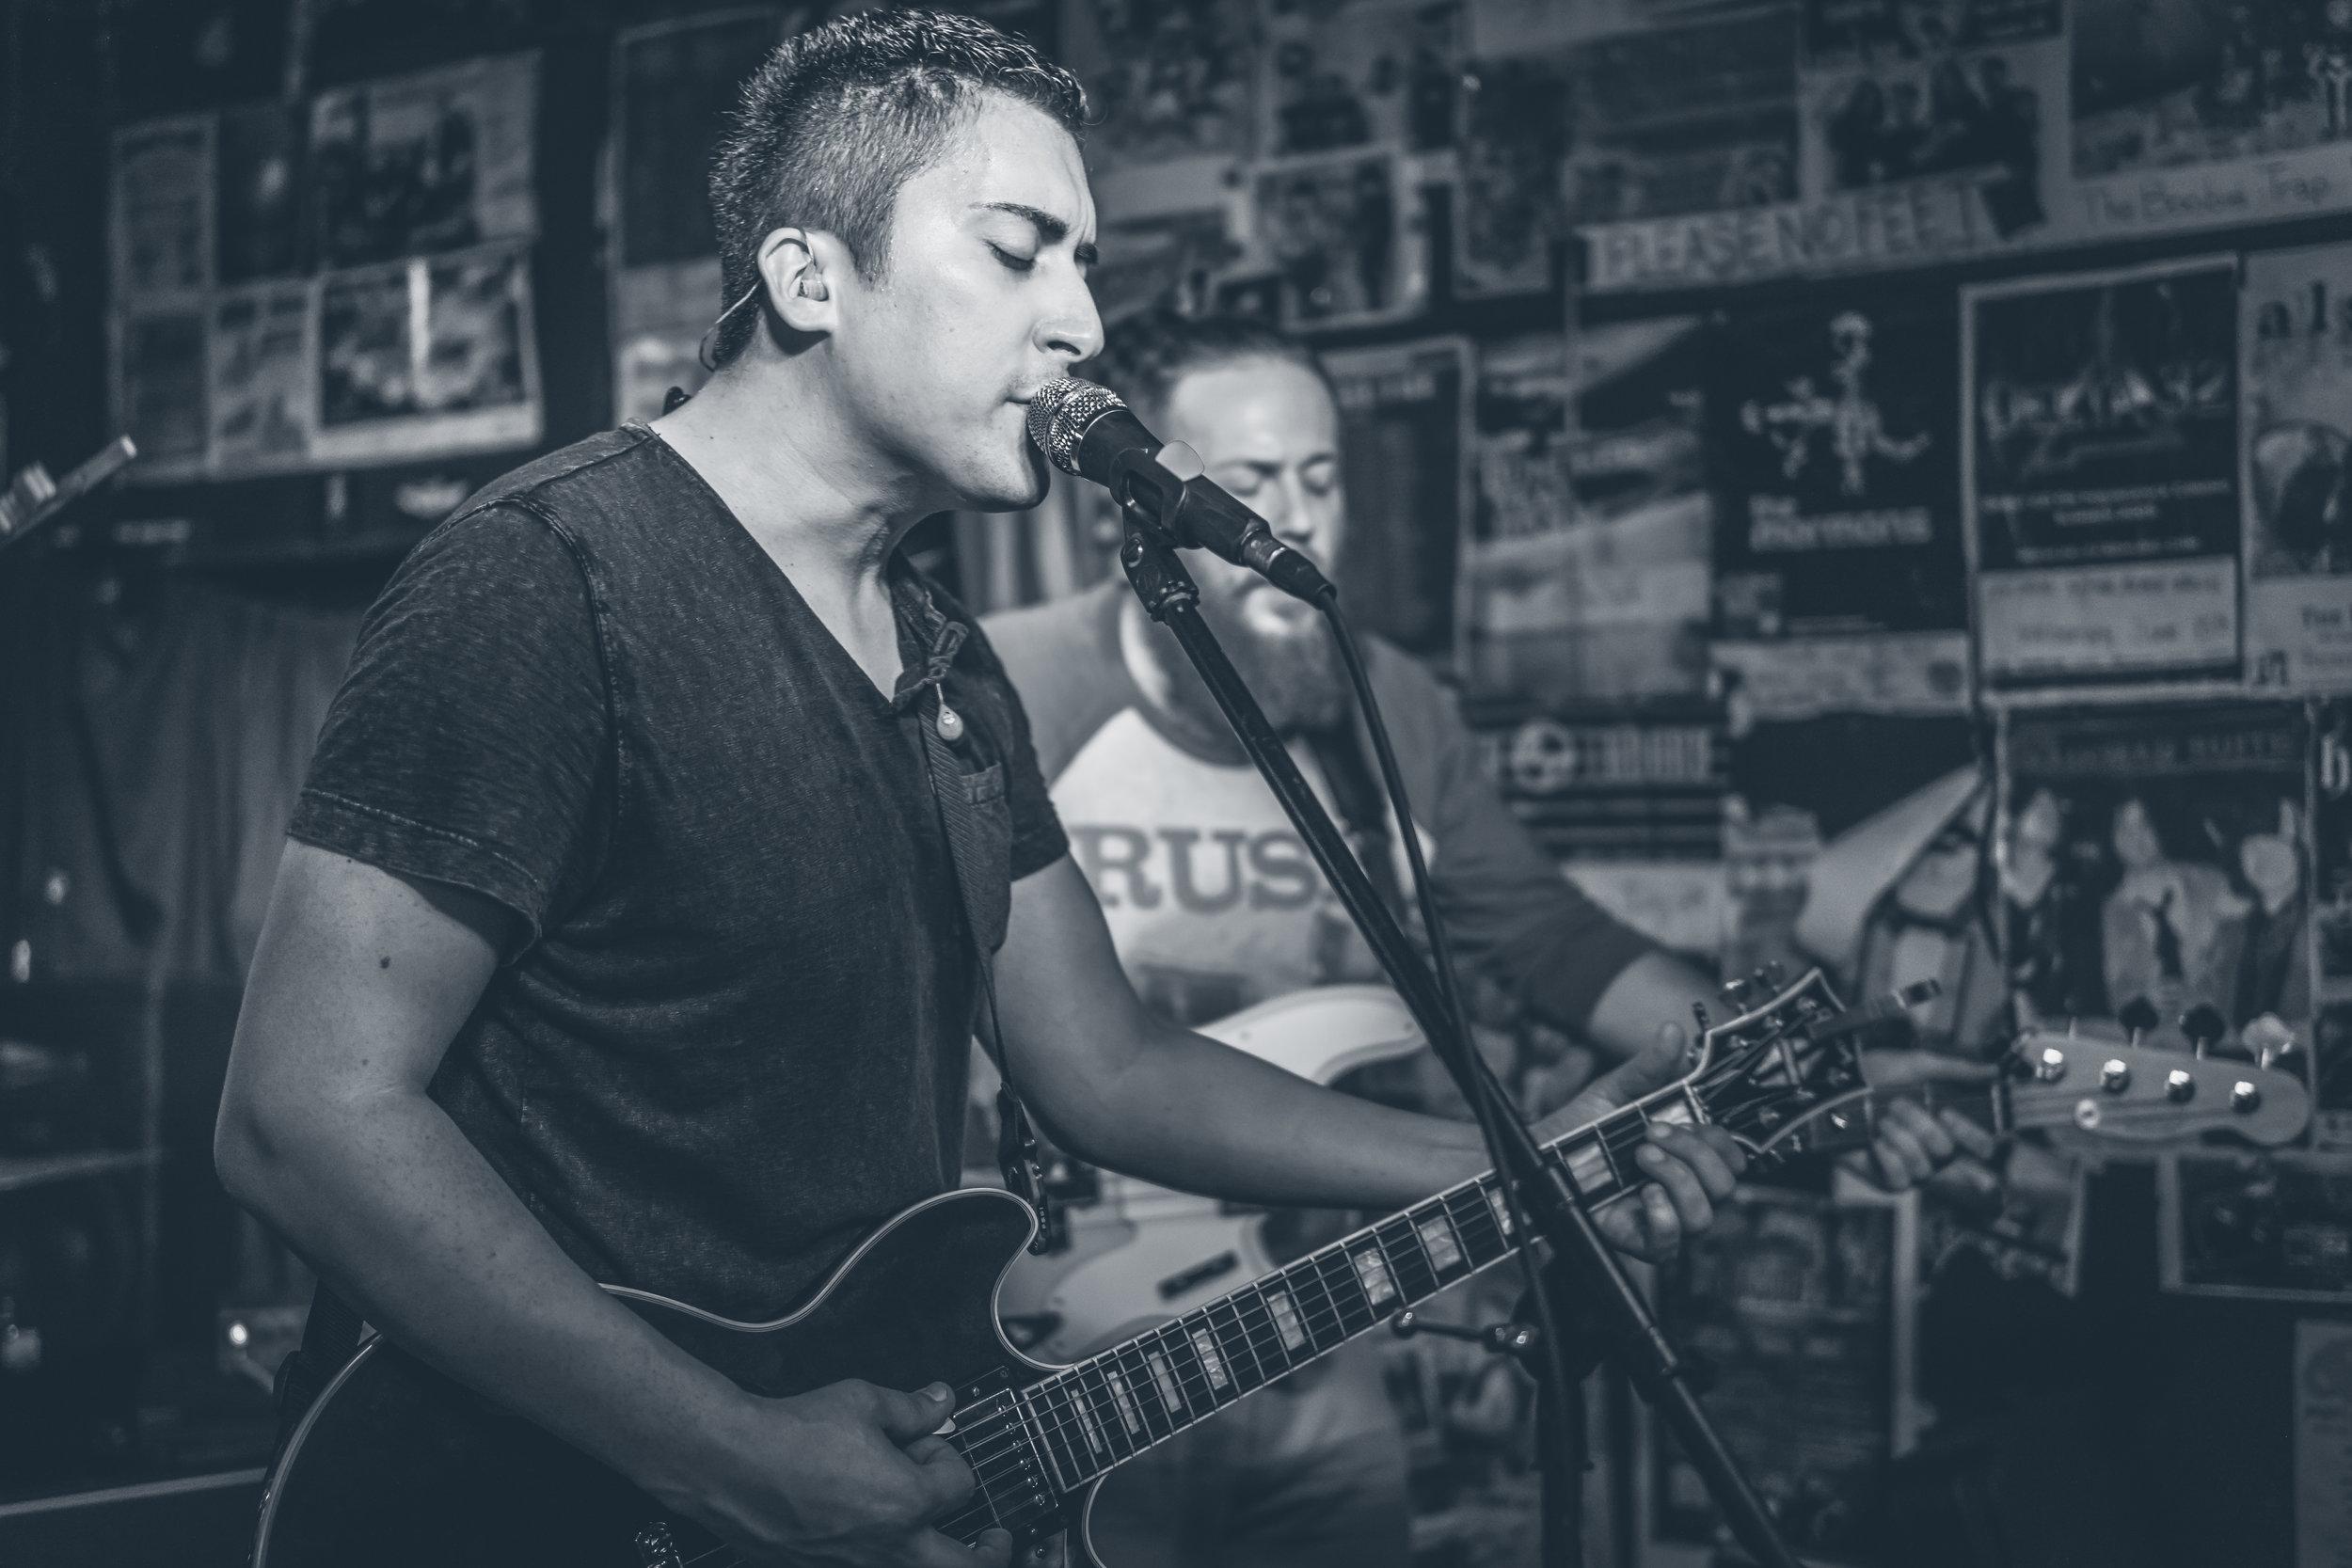 FM Pilots - Tulsa Rock Band - The Boobie Trap Bar Topeka, KS 070916-9.jpg